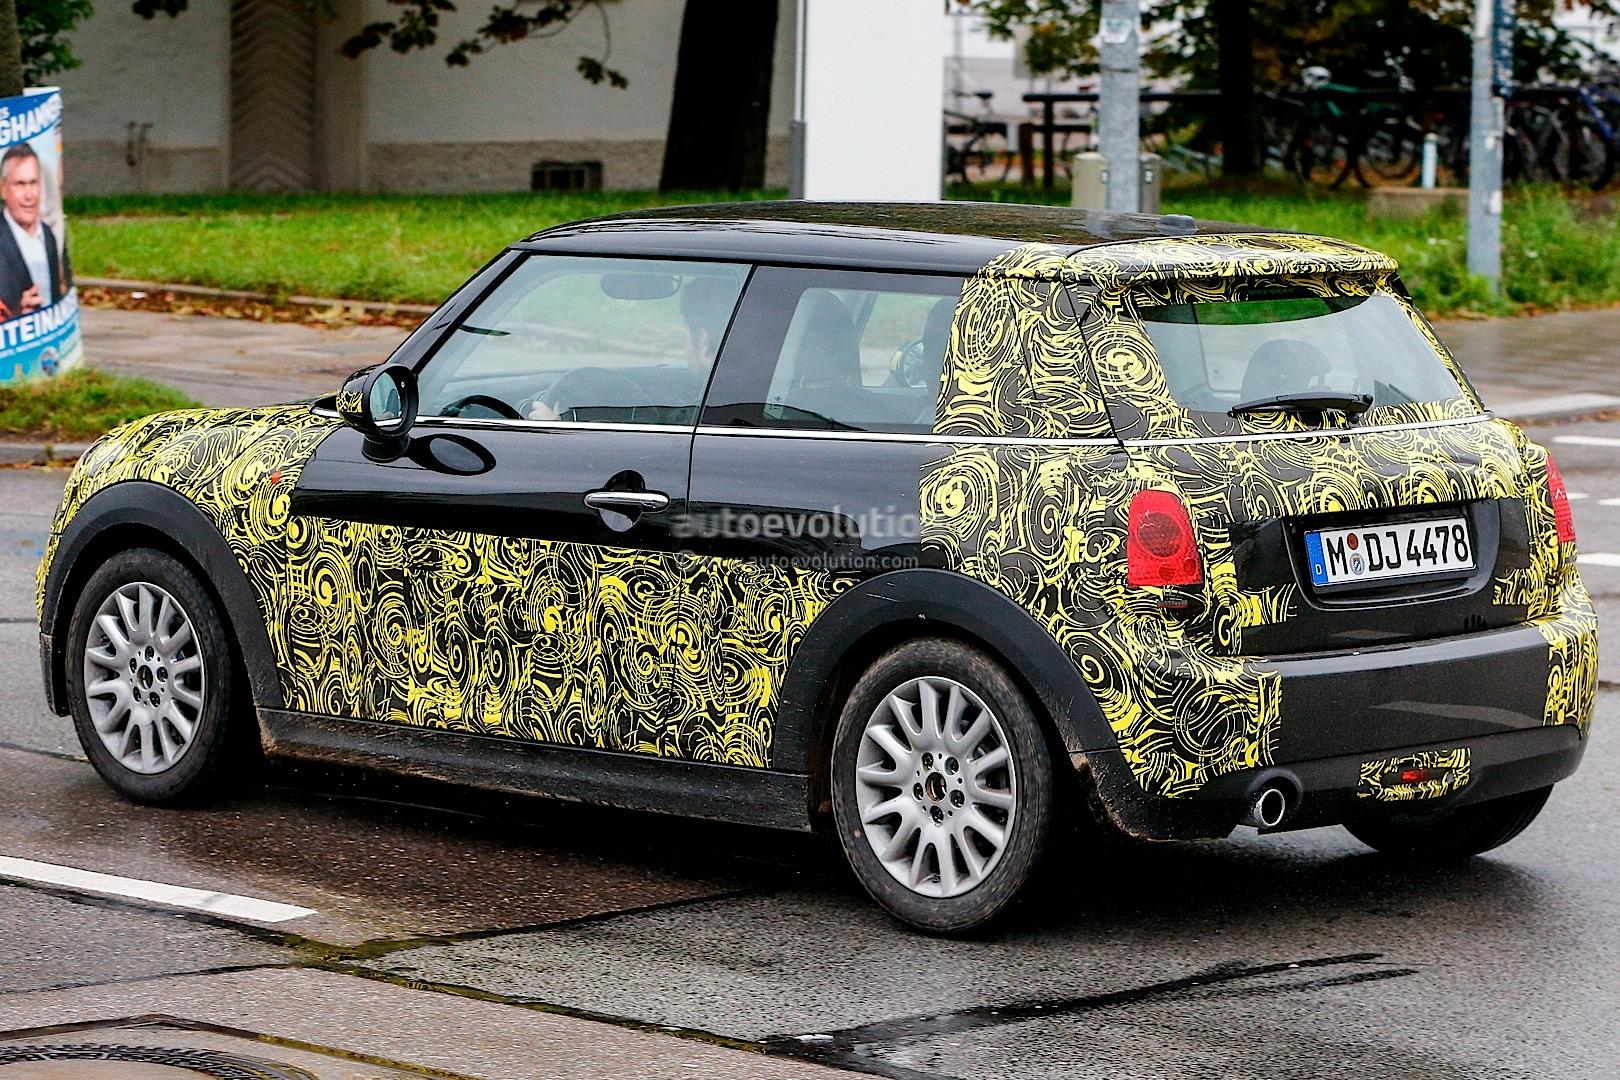 Spyshots: MINI Cooper Mk3 with Less Camouflage - autoevolution